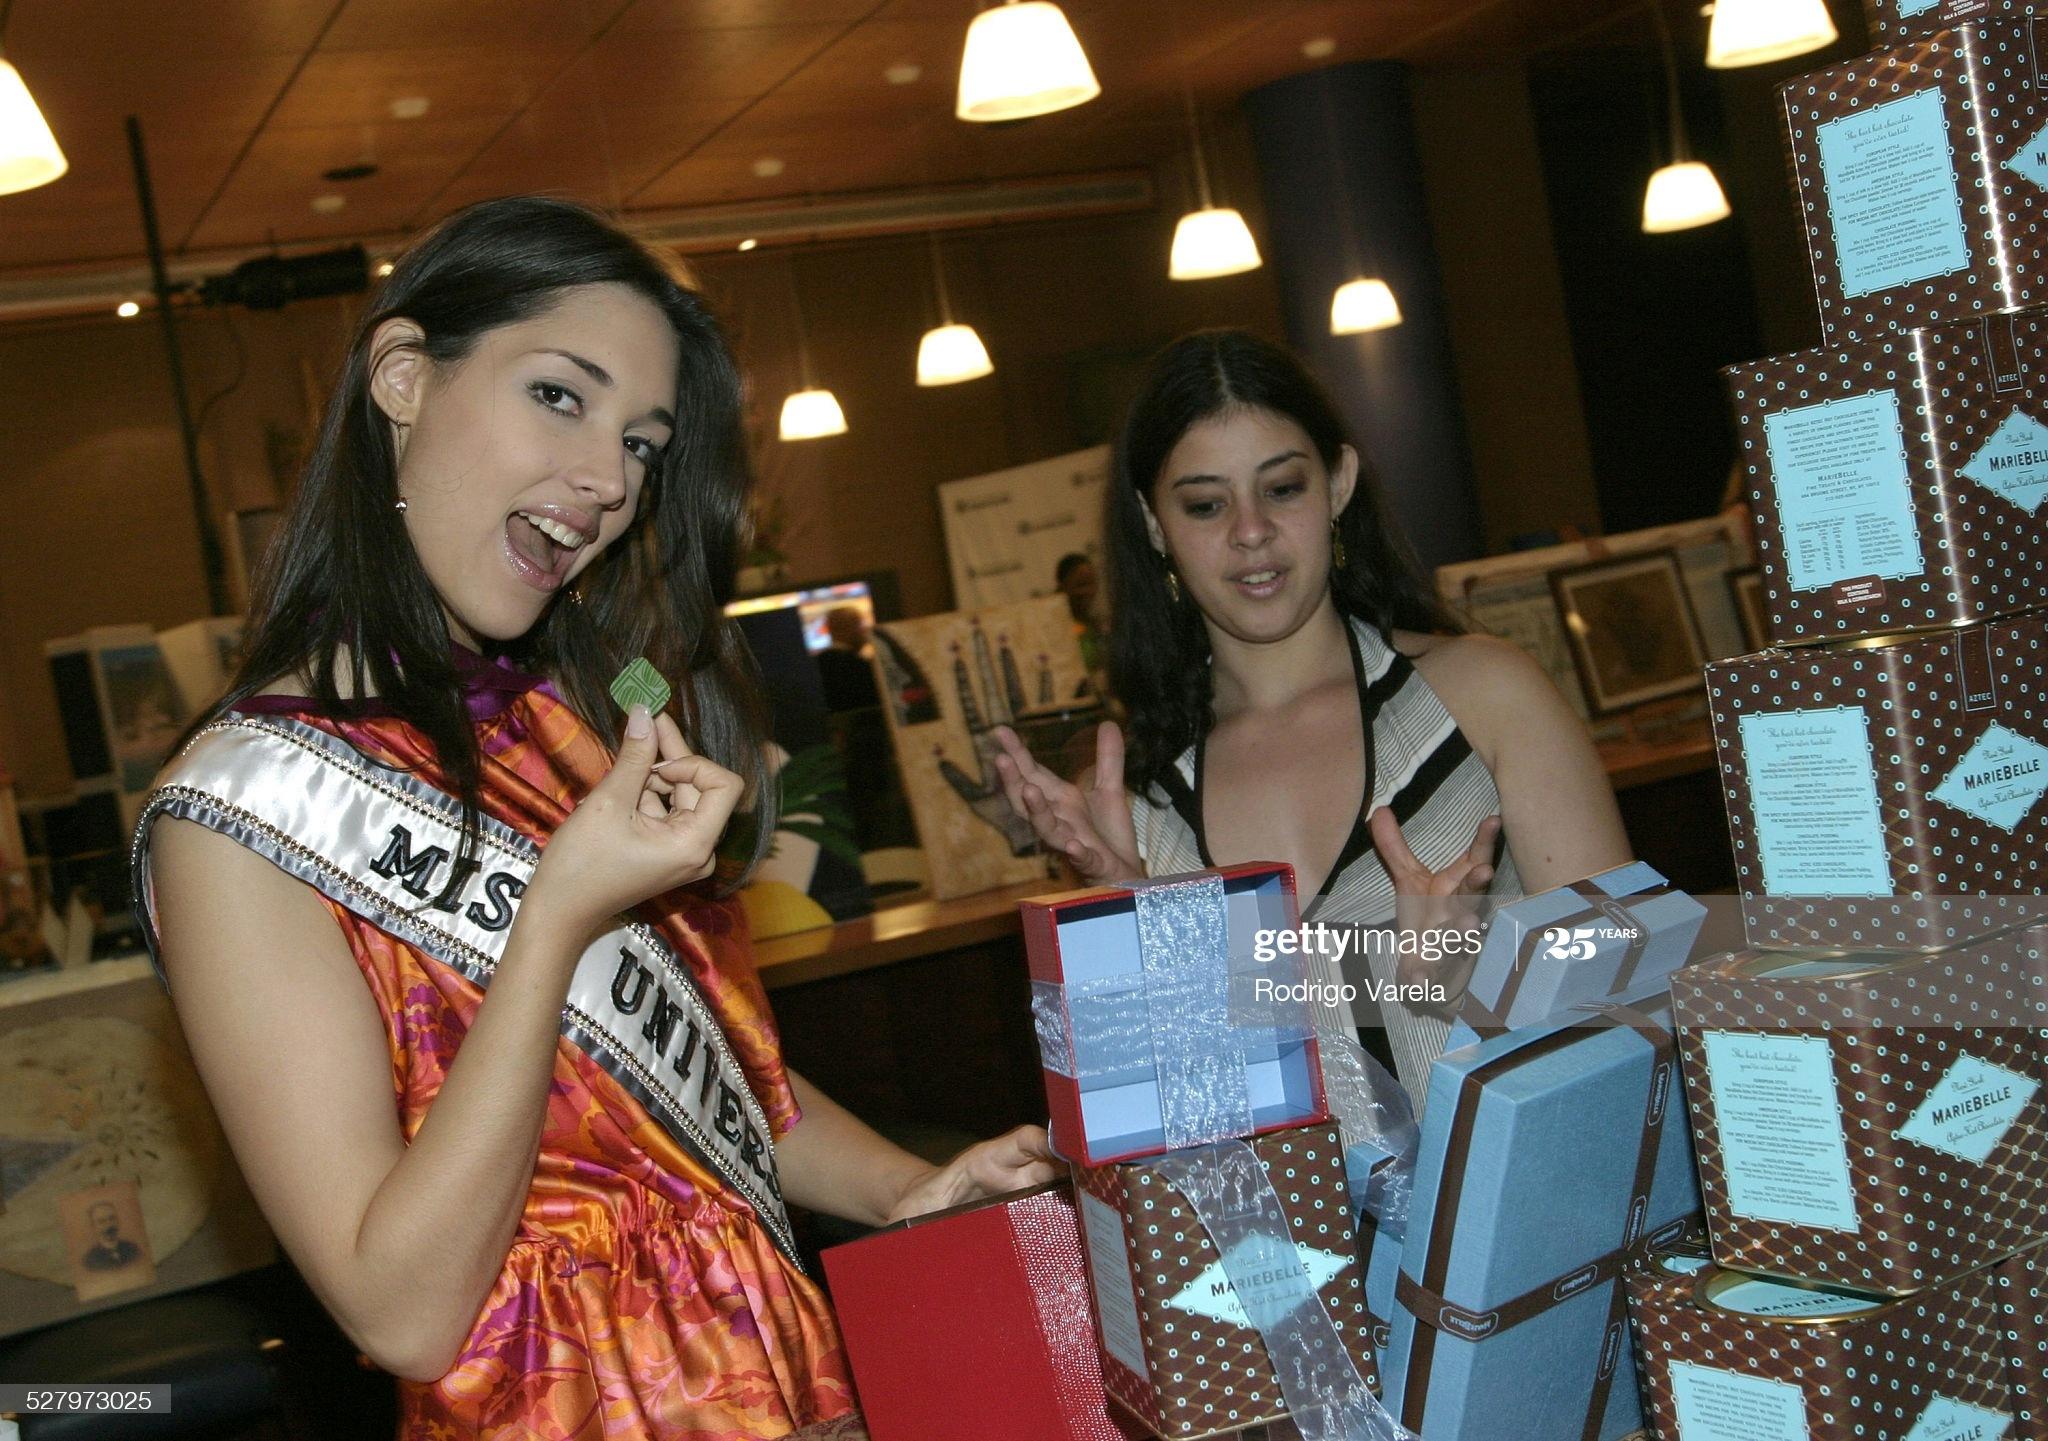 ════ ∘◦❁◦∘ ════ Amelia Vega, Miss Universe 2003. ════ ∘◦❁◦∘ ════ - Página 12 Miss-u51